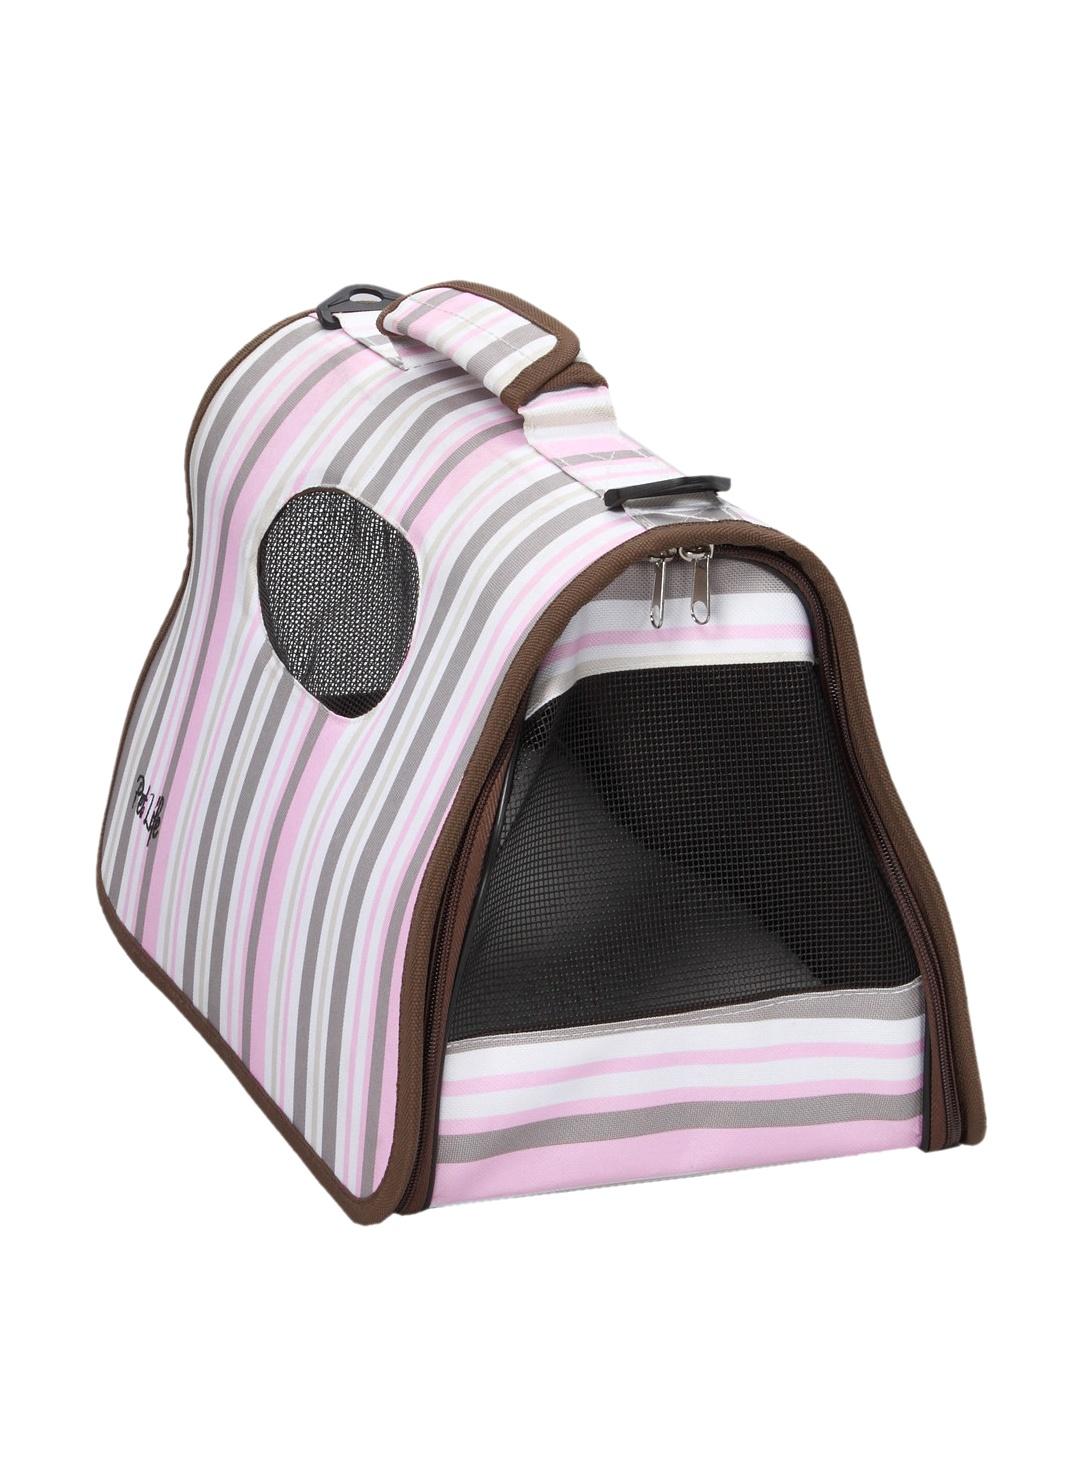 Pet Life Folding Zippered Casual Pet Carrier (Stripe Pattern)